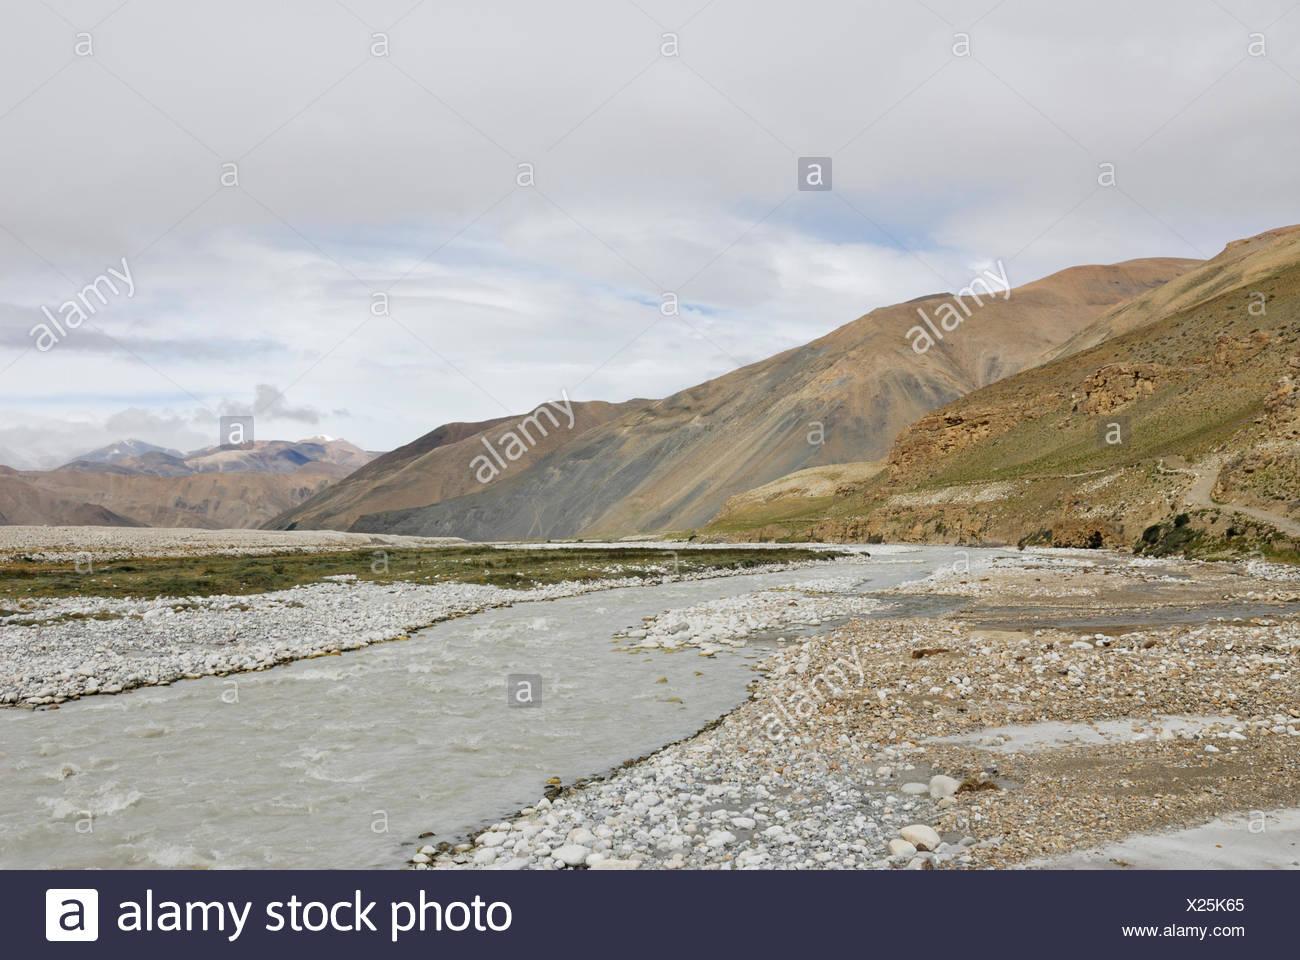 Barren mountain landscape near the Rongbuk Monastery, Himalayas, Tibet, China, Asia - Stock Image